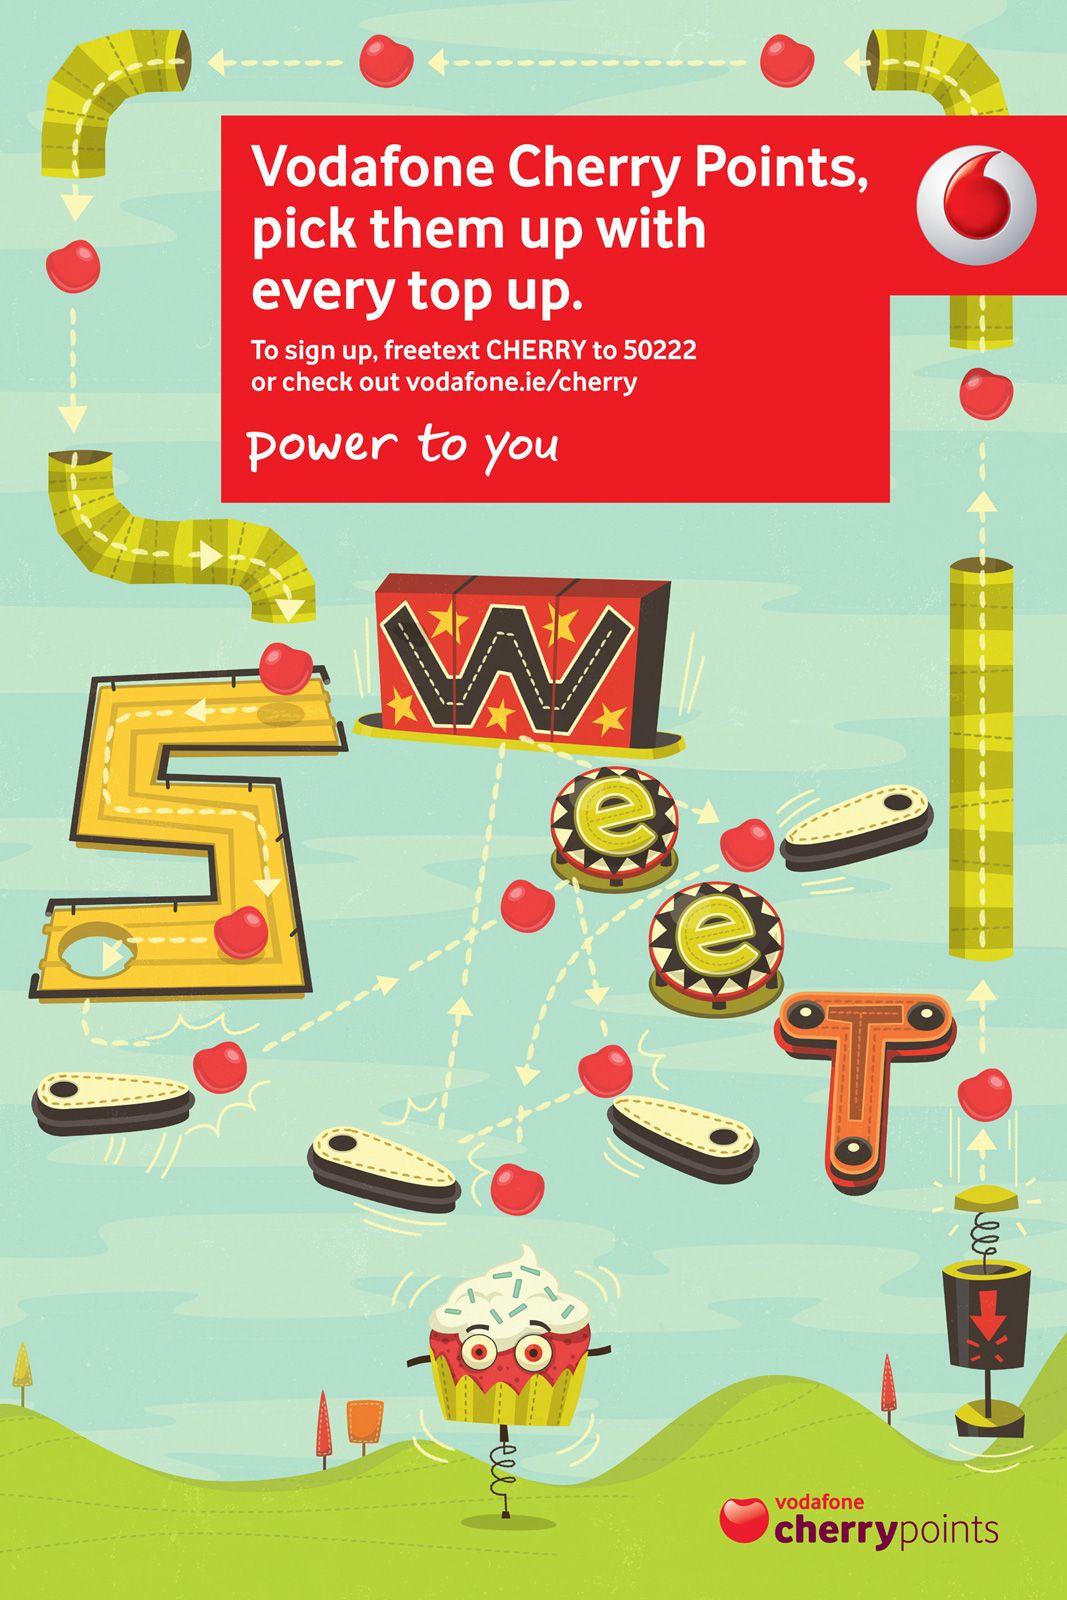 Vodafone Vodafone, Pointe, Pinball